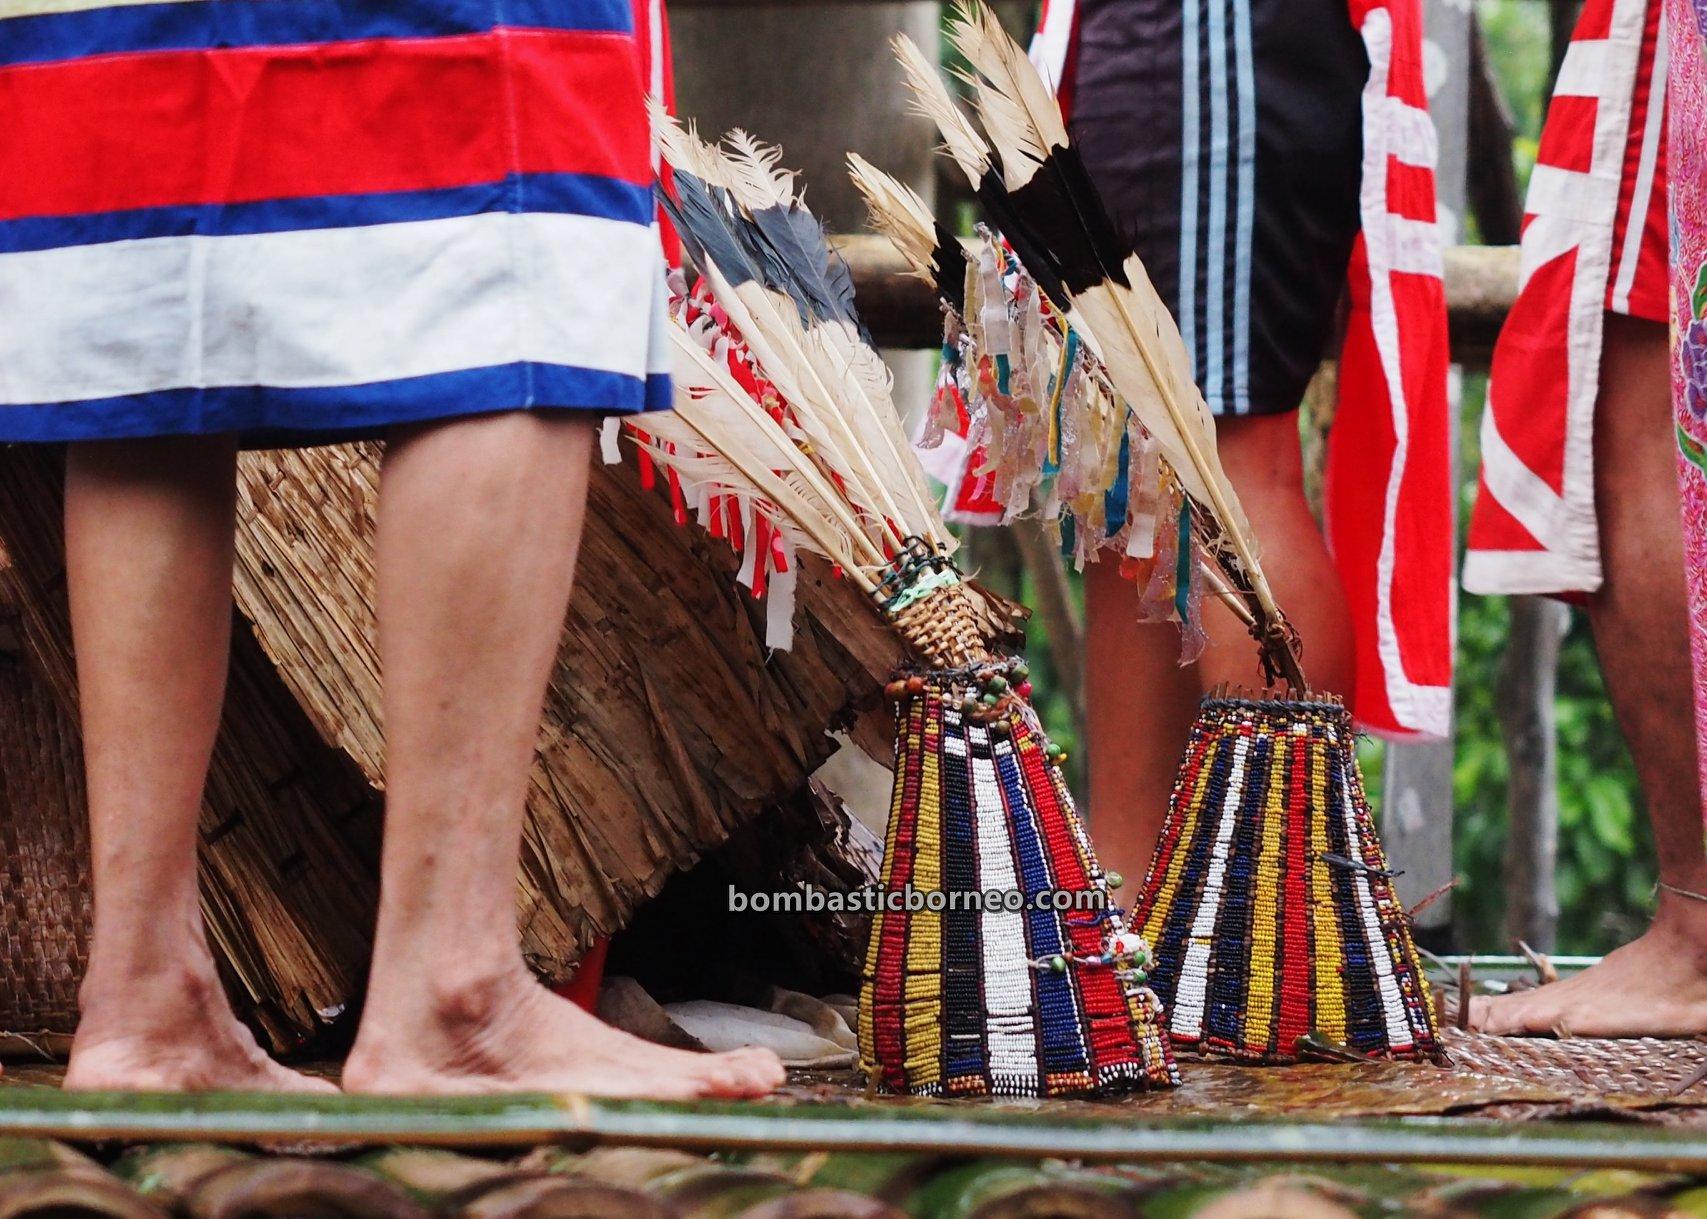 Nyobeng Kambih, traditional, destination, Culture, Indonesia, West Kalimantan, Desa Bengkawan, Ethnic, native, tribal, Tourism, Travel guide, Trans Borneo, 跨境婆罗洲游踪, 印尼西加里曼丹, 原住民丰收节日,